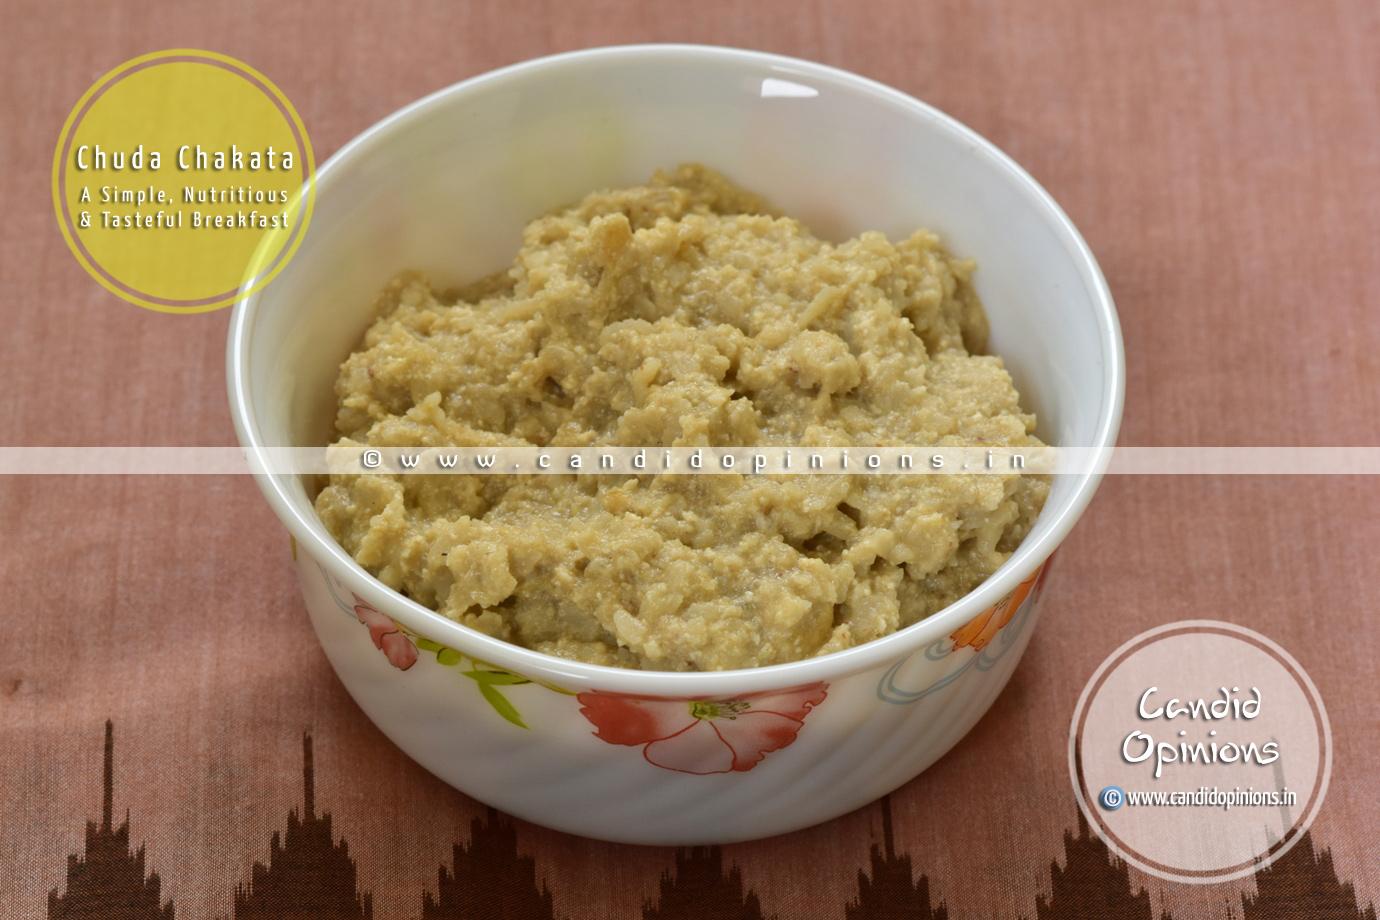 Chuda Chakata - A Simple, Nutritious and Tasteful Breakfast